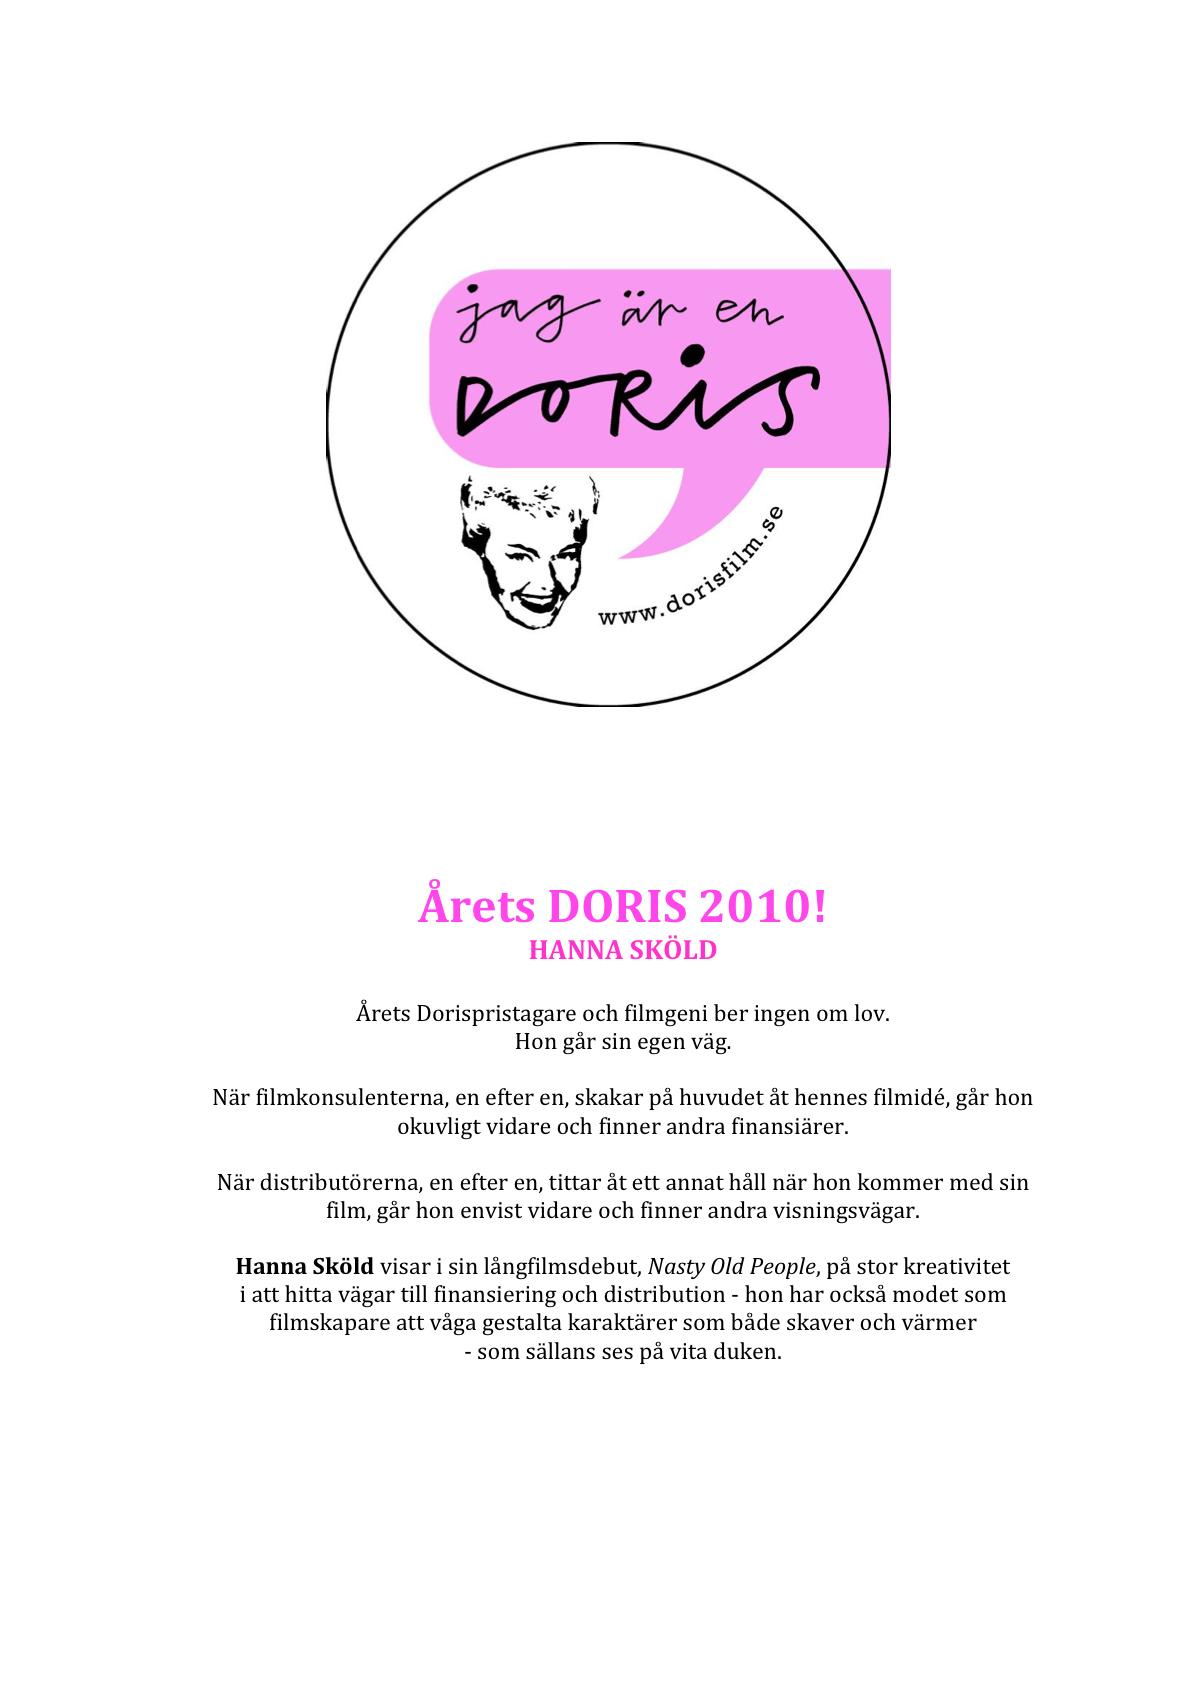 Diplom Dorispris 2010 Hanna Sköld-2